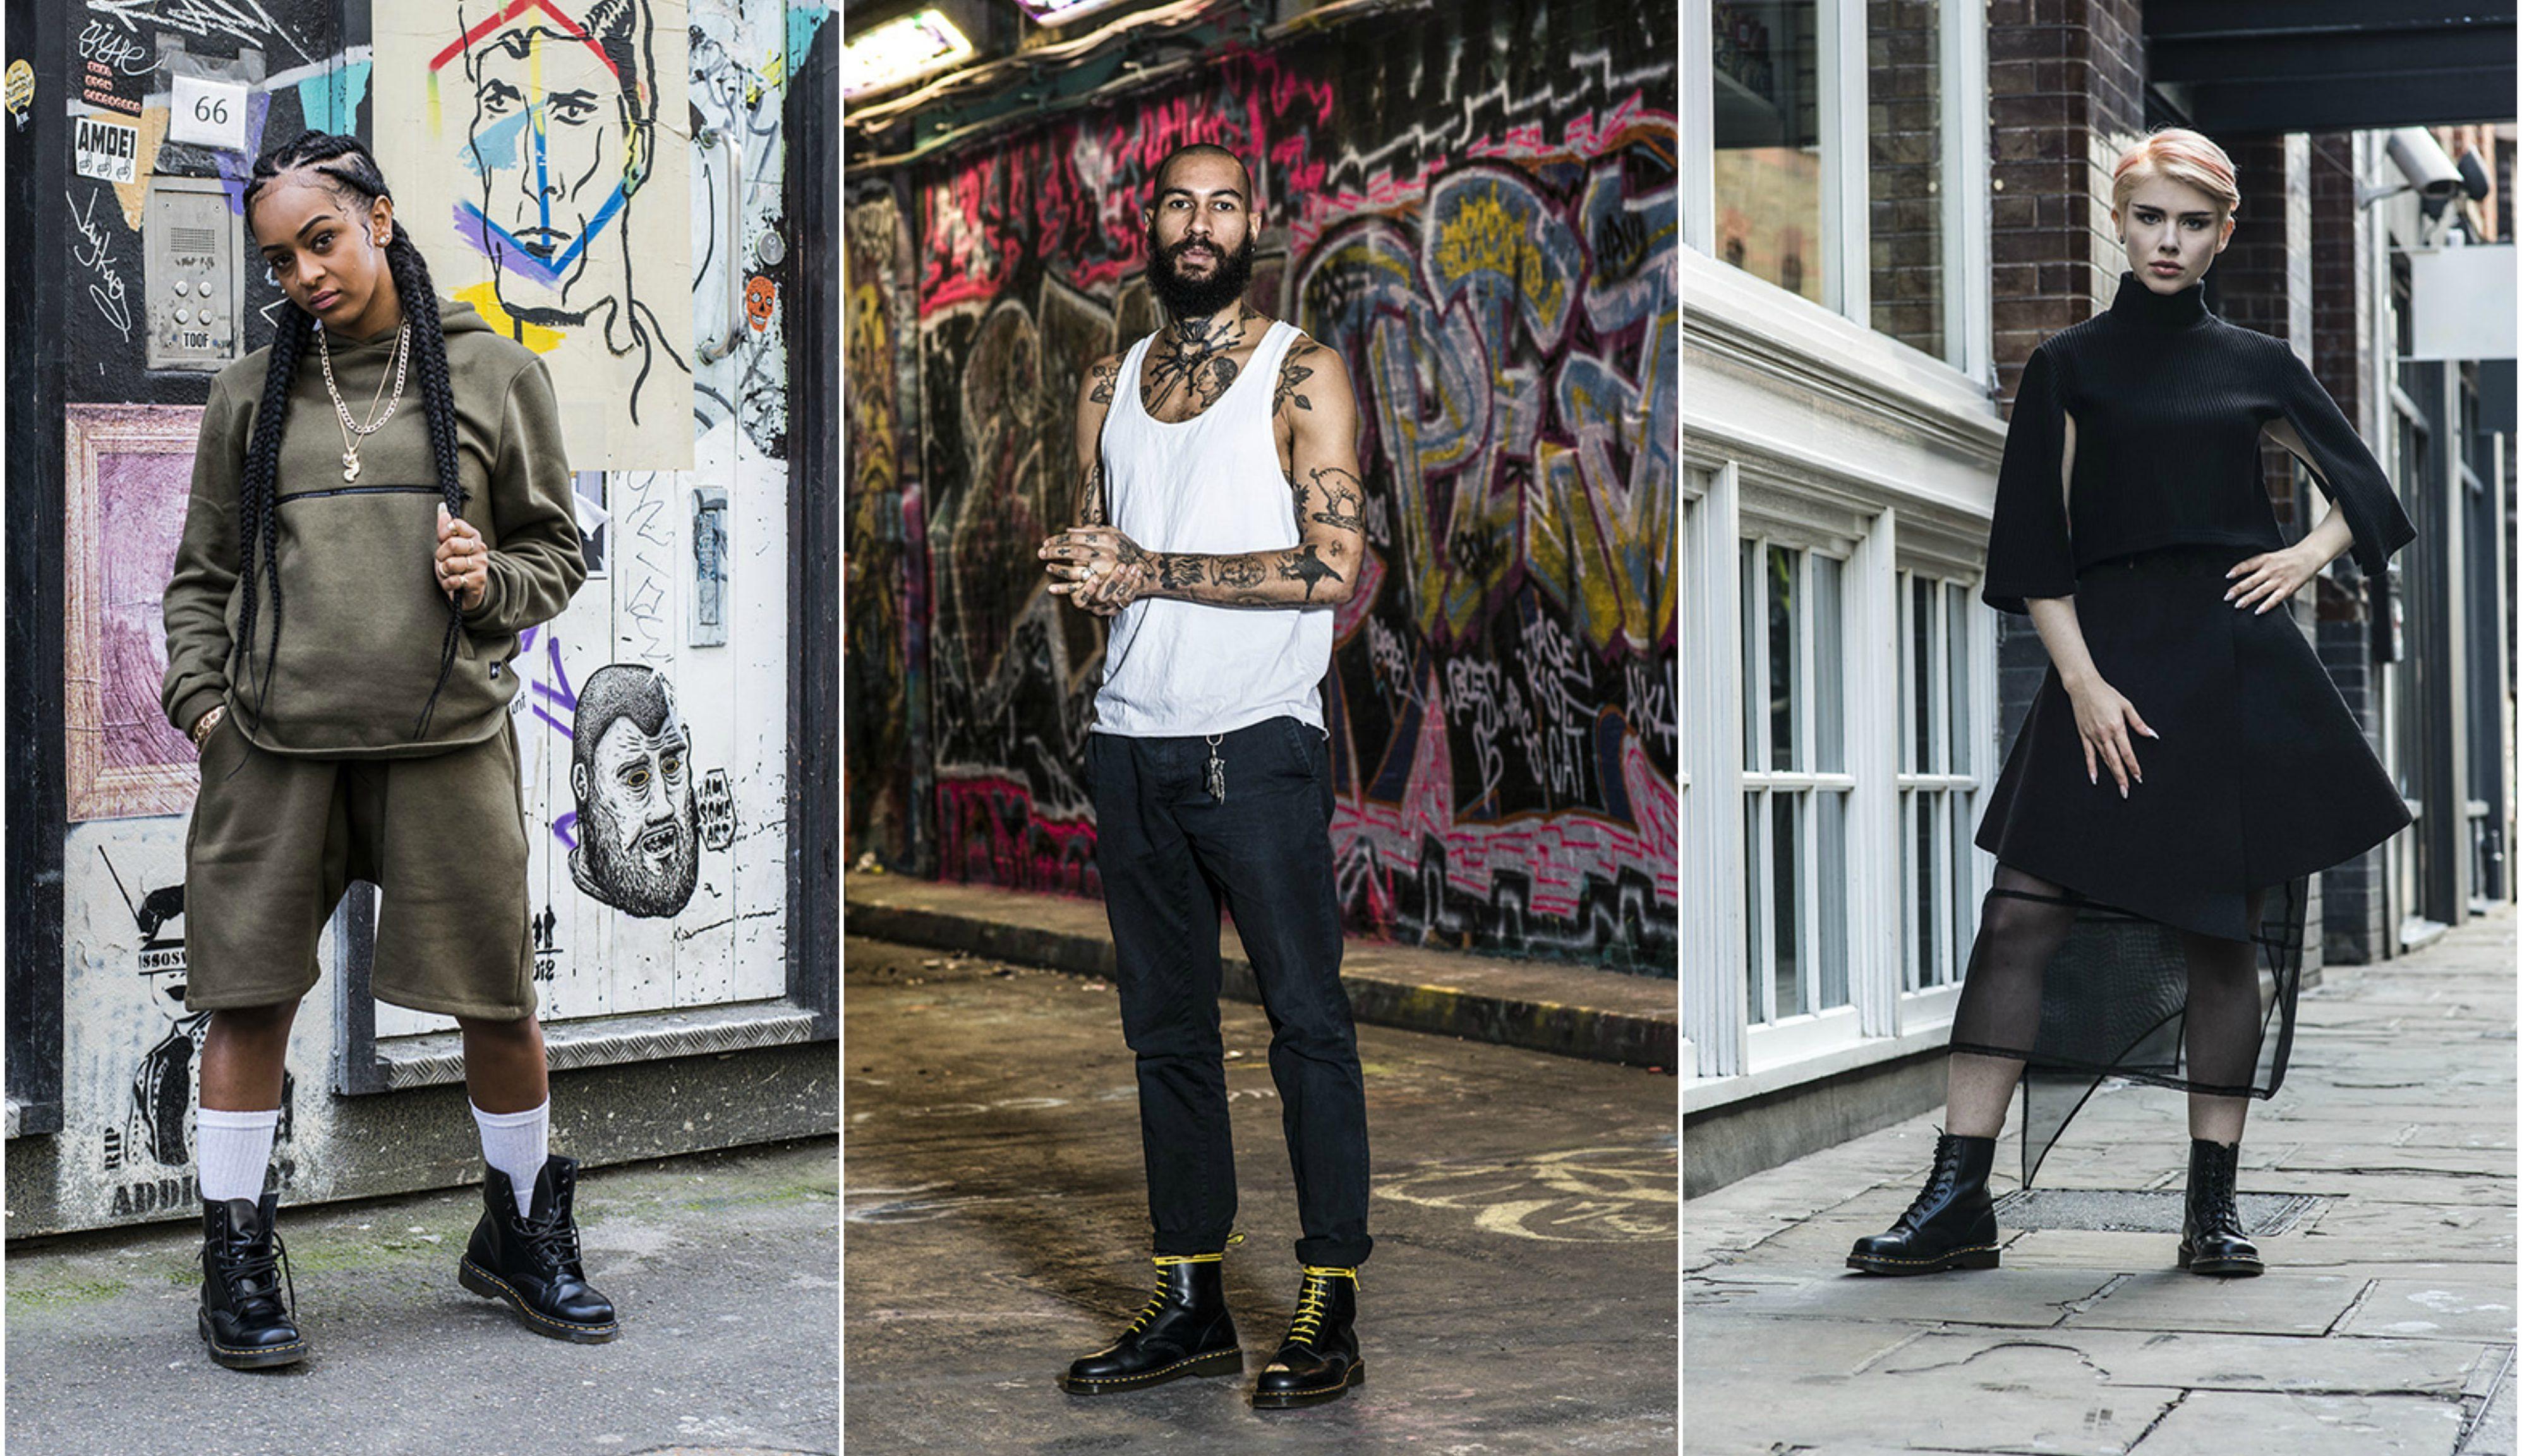 b0a139c1fb4 Doc Martens are cool again with a new fashion customer — Quartzy